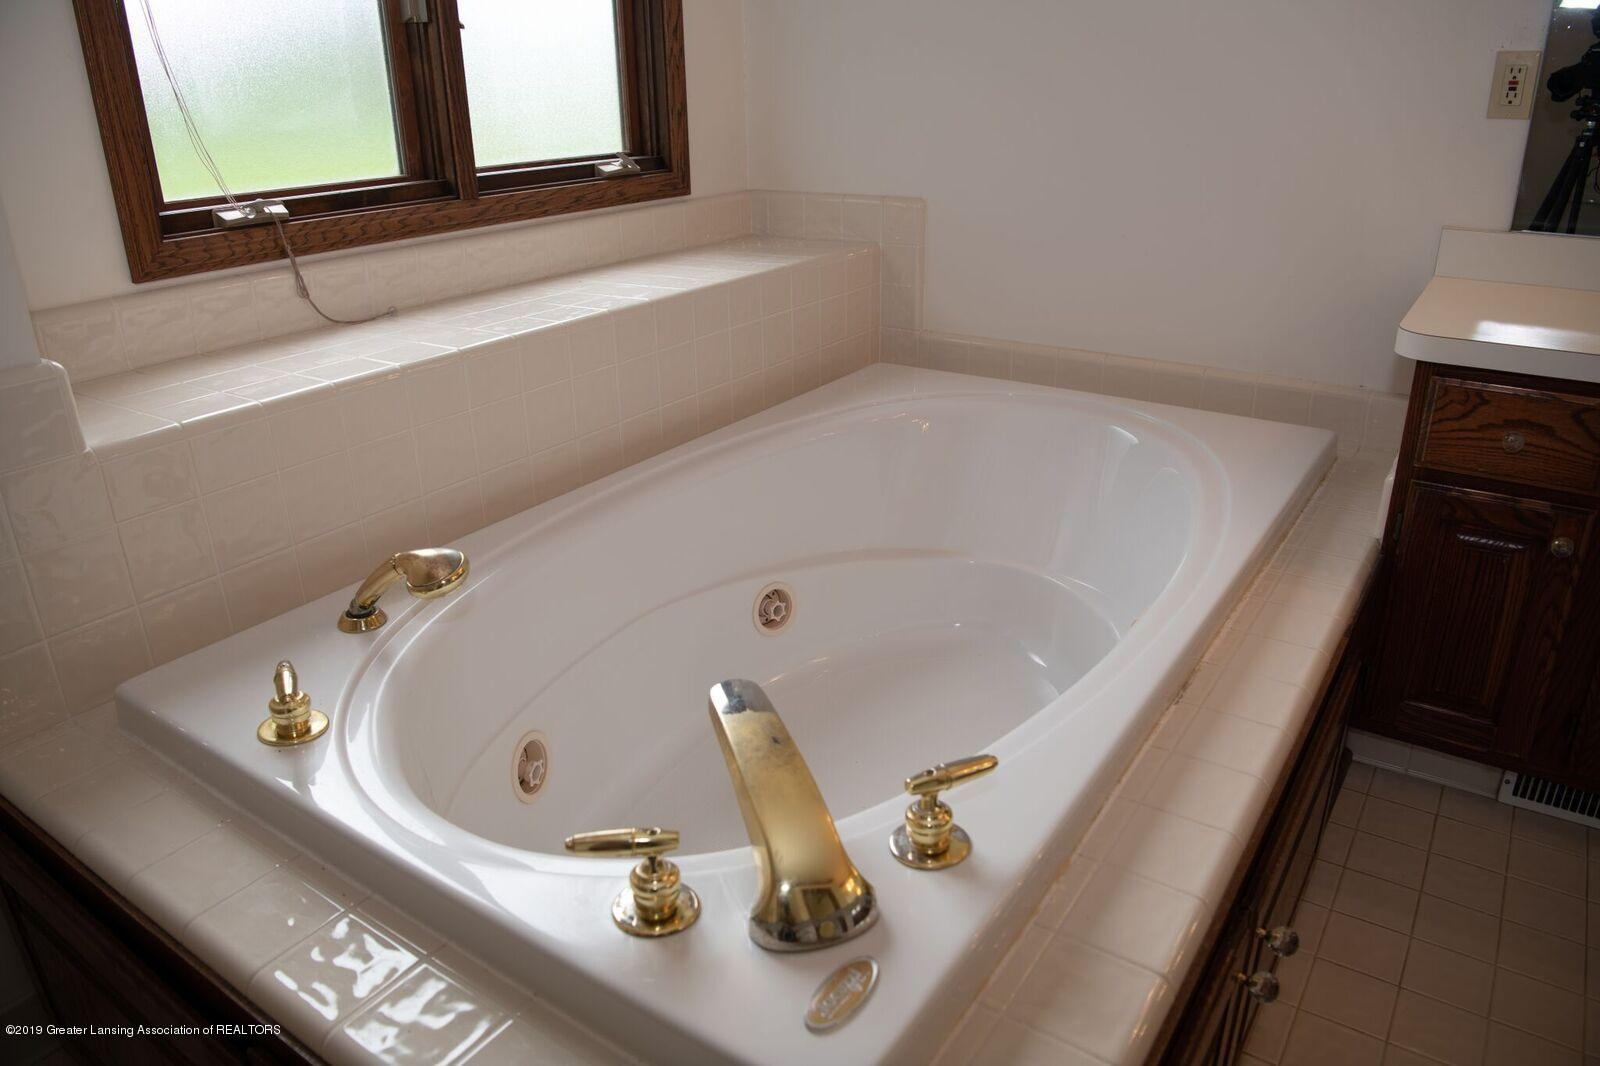 320 Cologne 41 - Cologne Master Bath 2 - 15